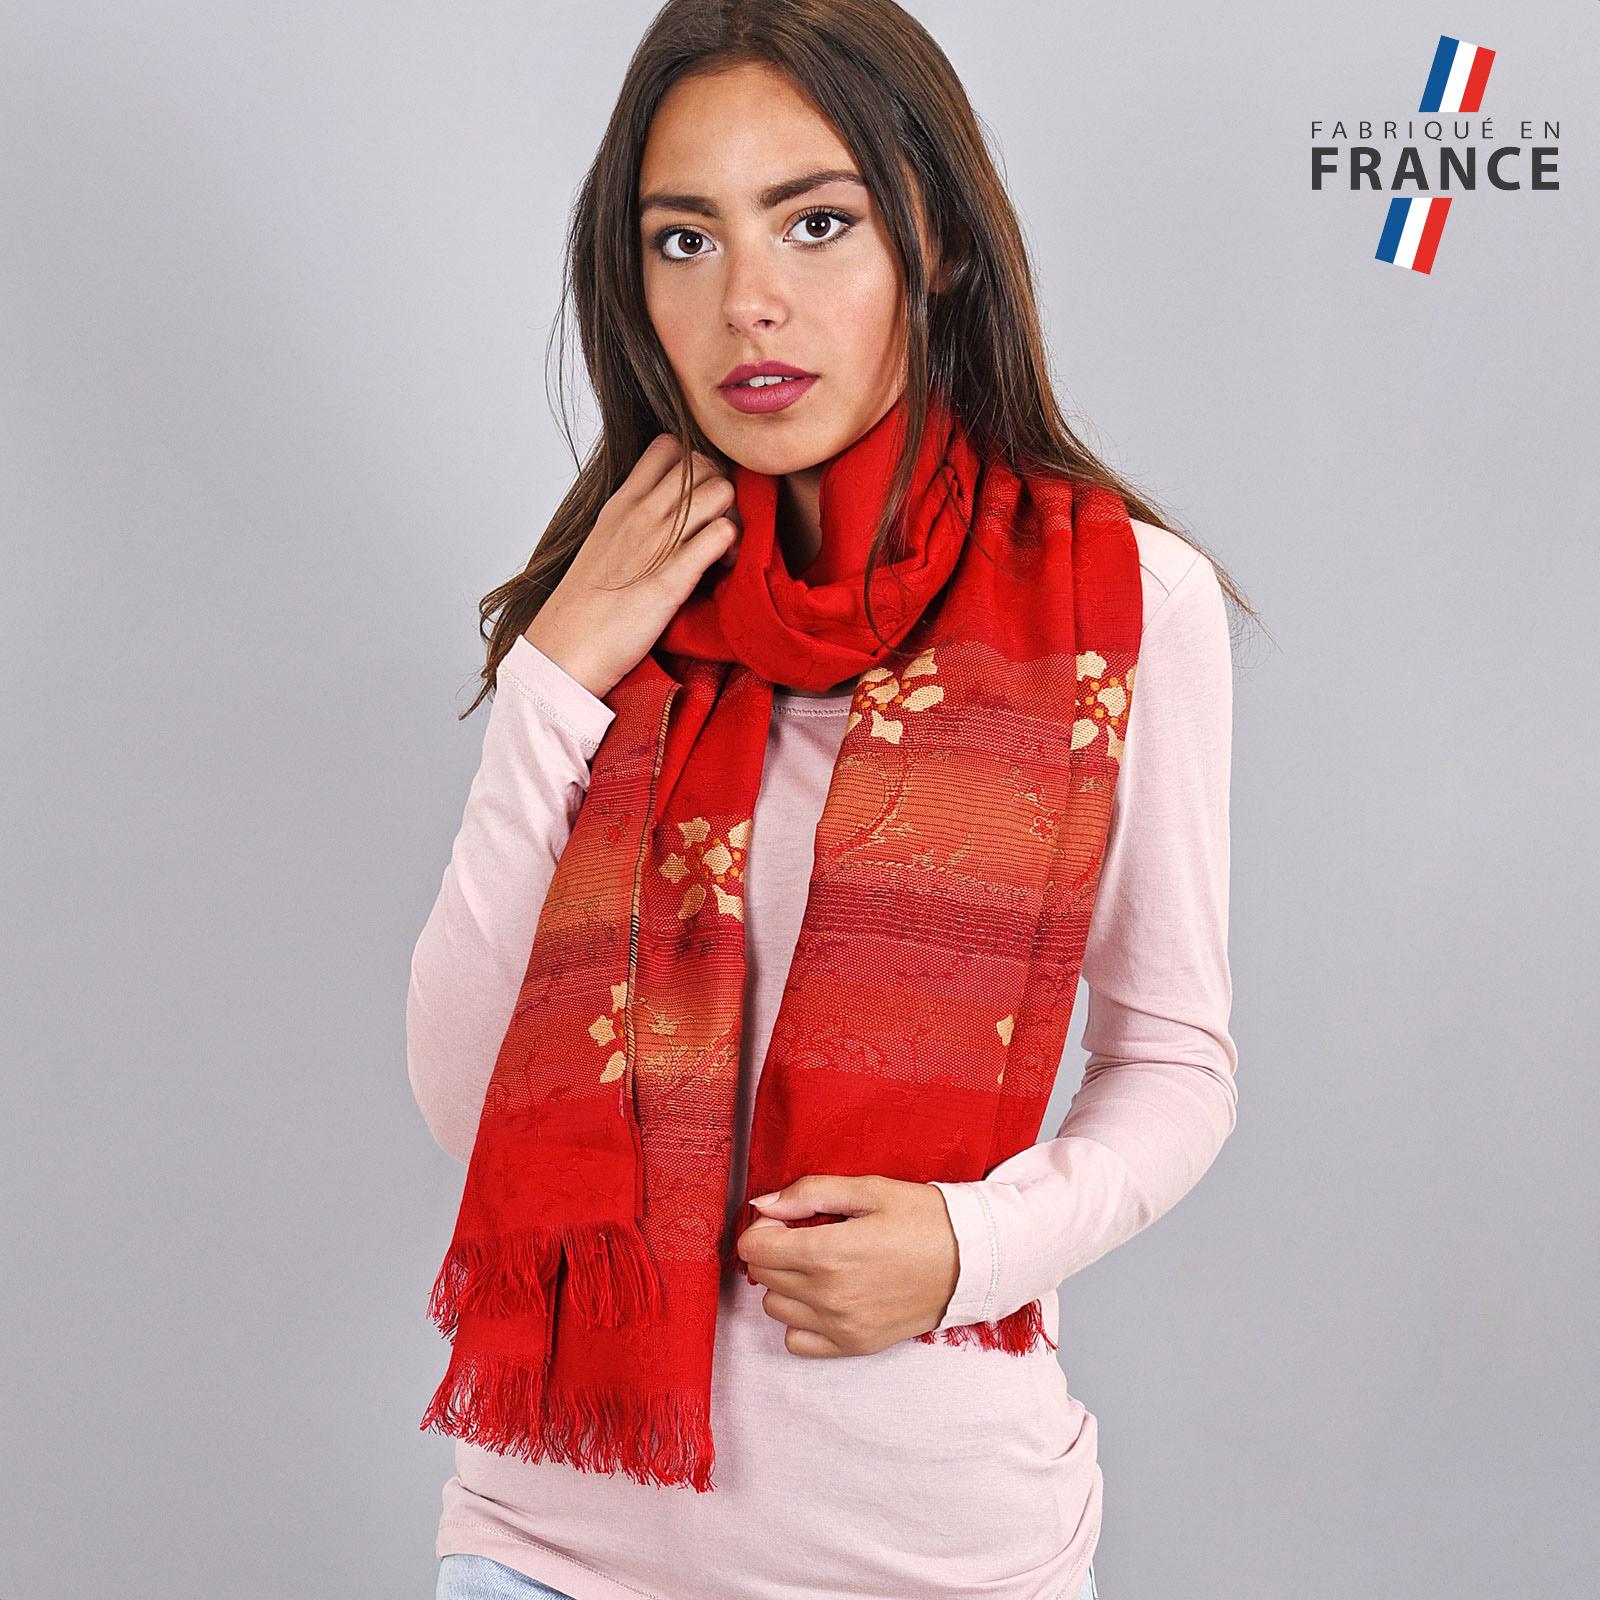 AT-03666-VF16-LB_FR-echarpe-legere-rouge-fleurs-dorees